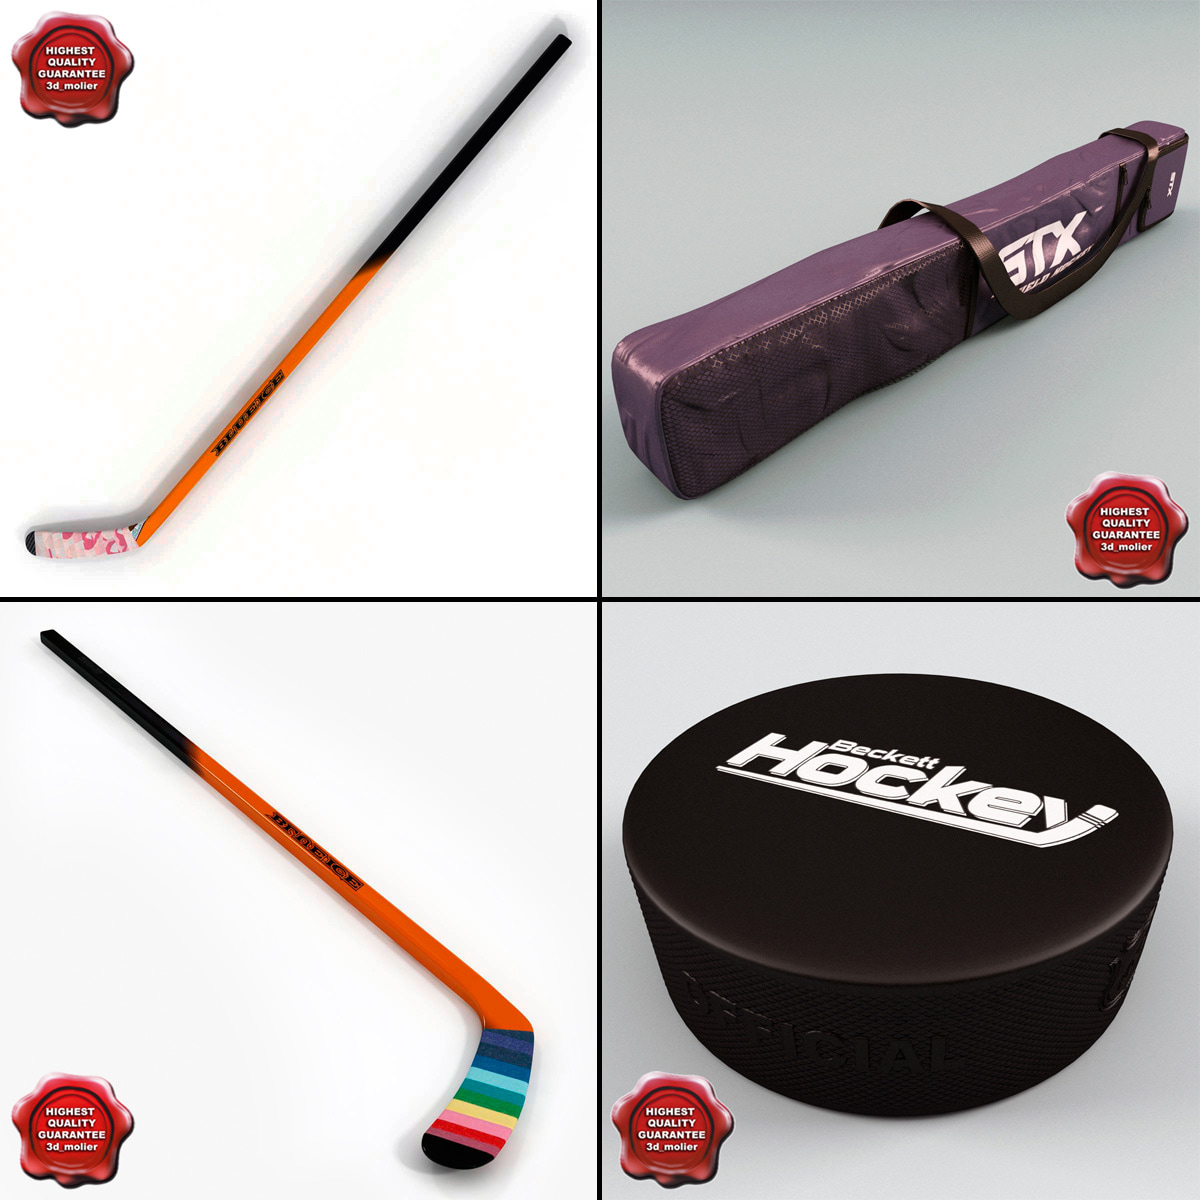 Hockey_Stick_Collection_v1_00.jpg